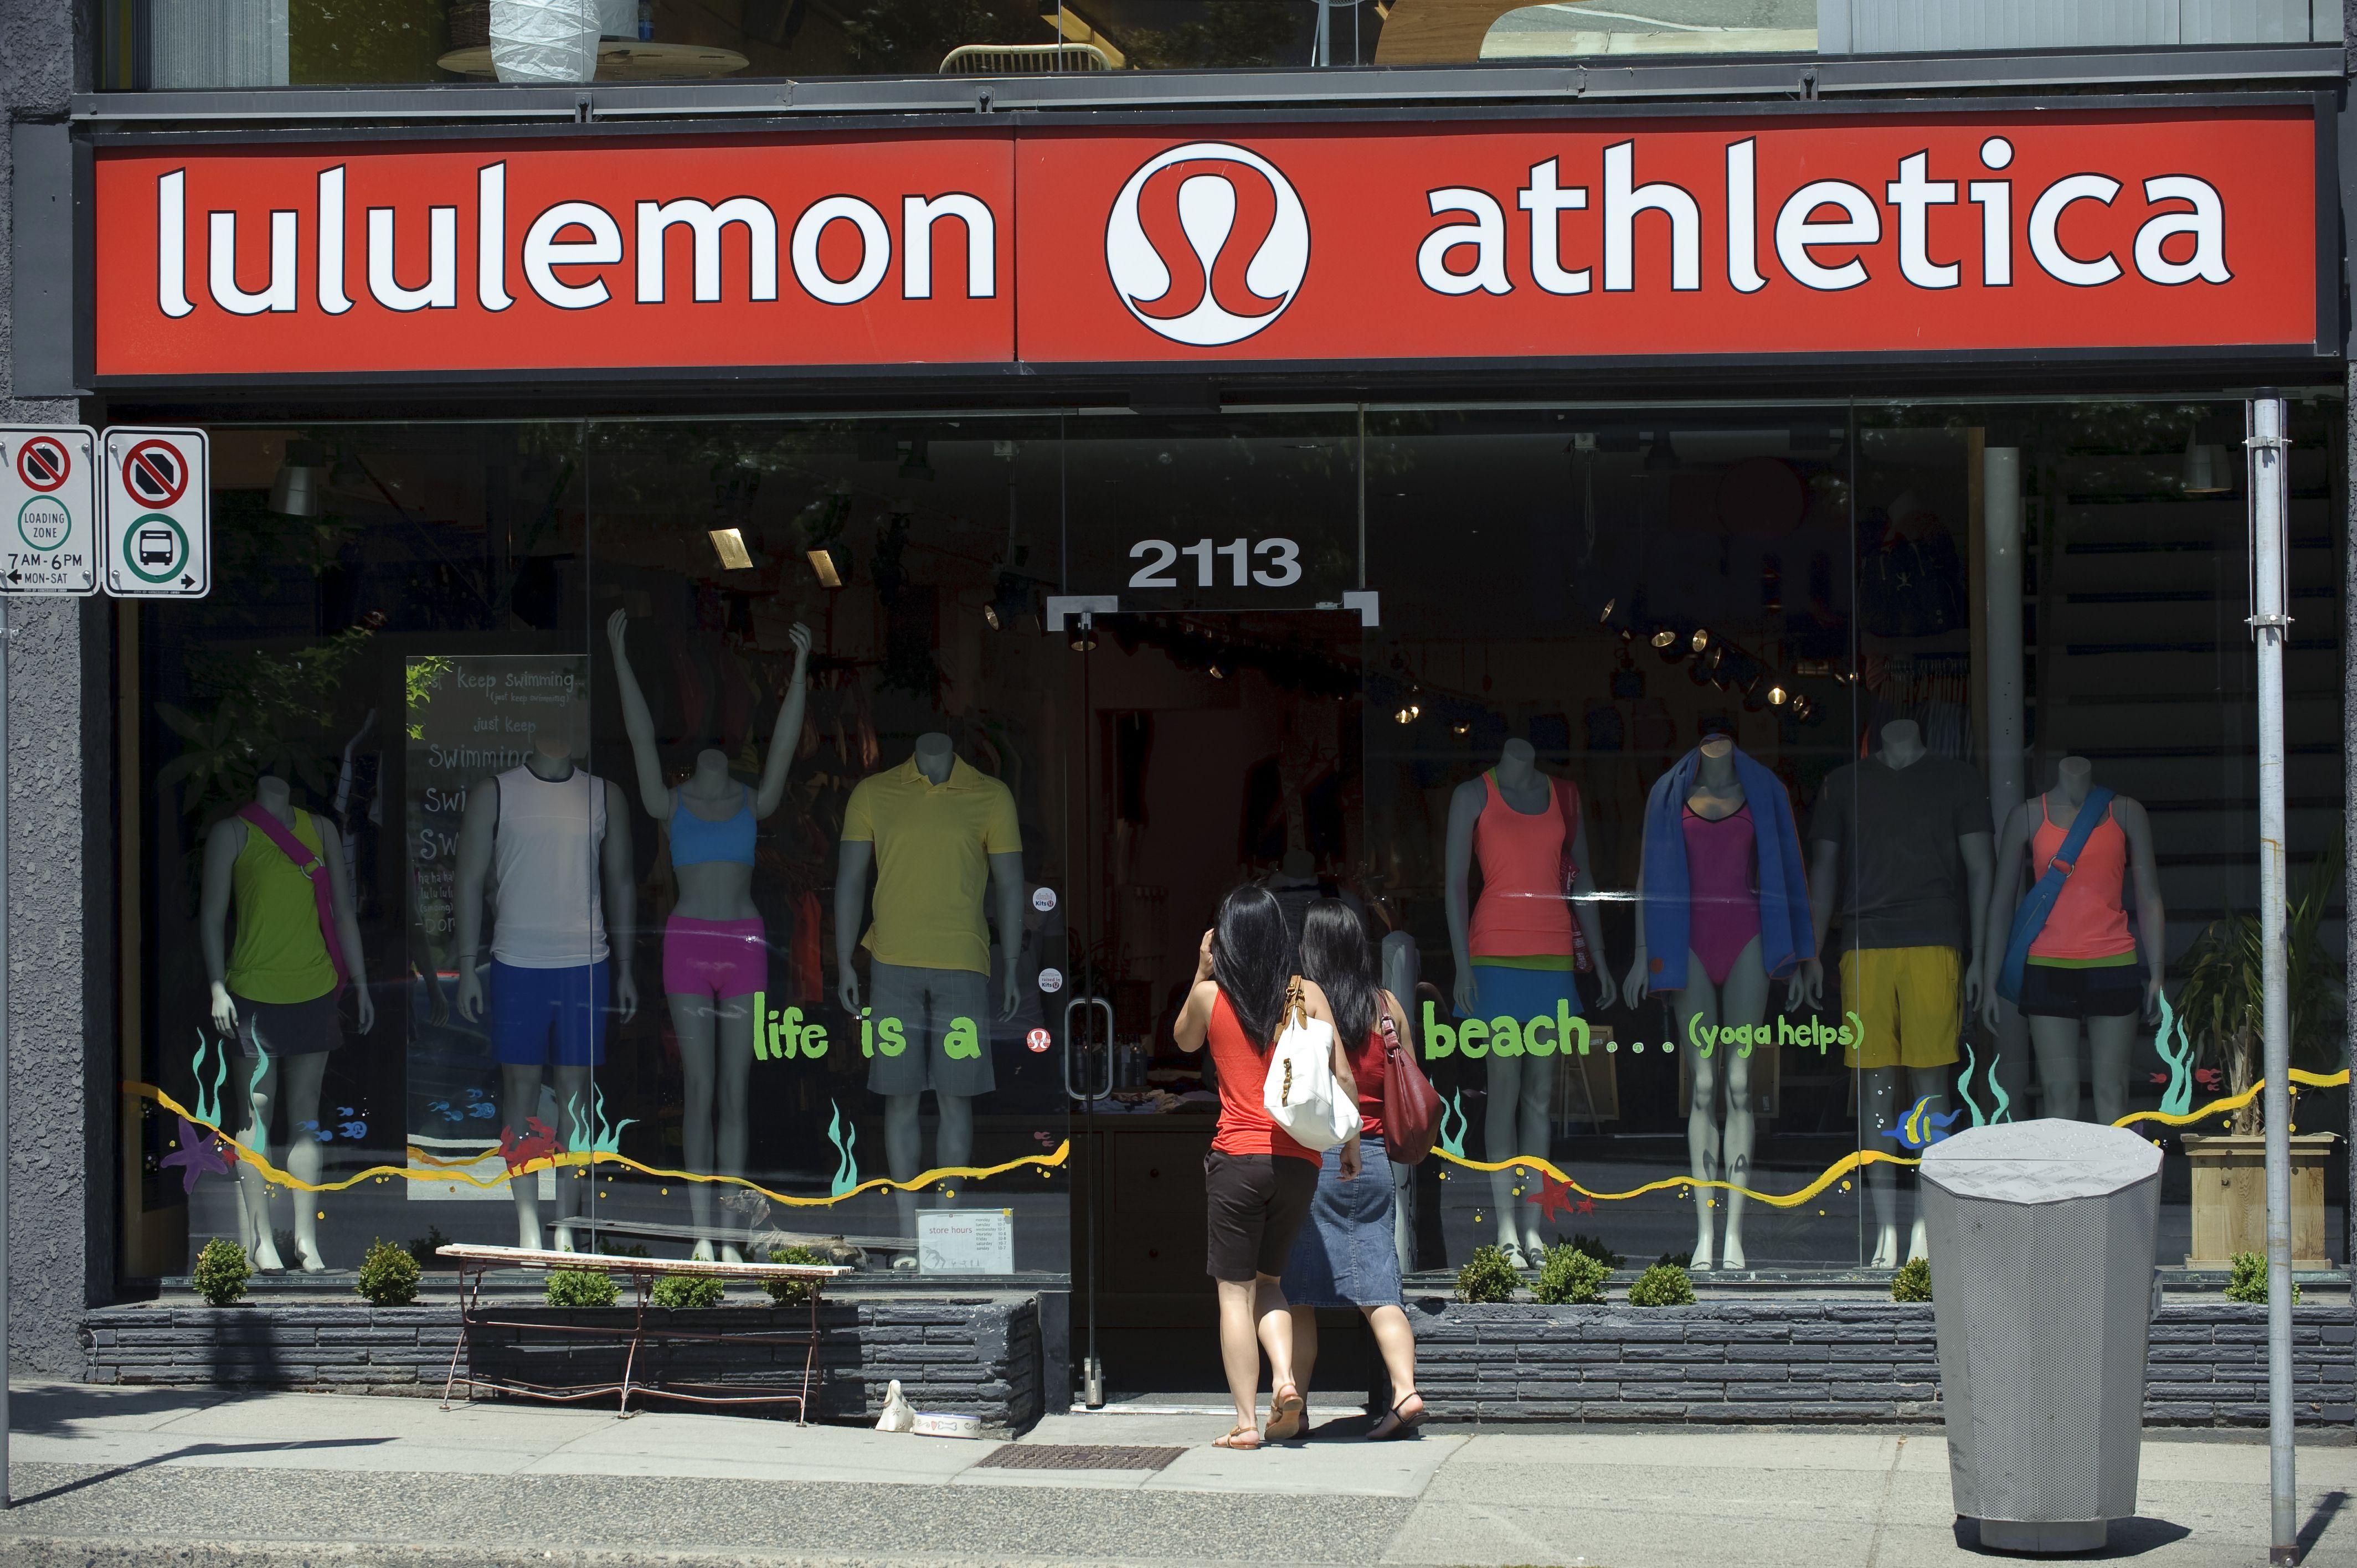 Two women entering a Lululemon store